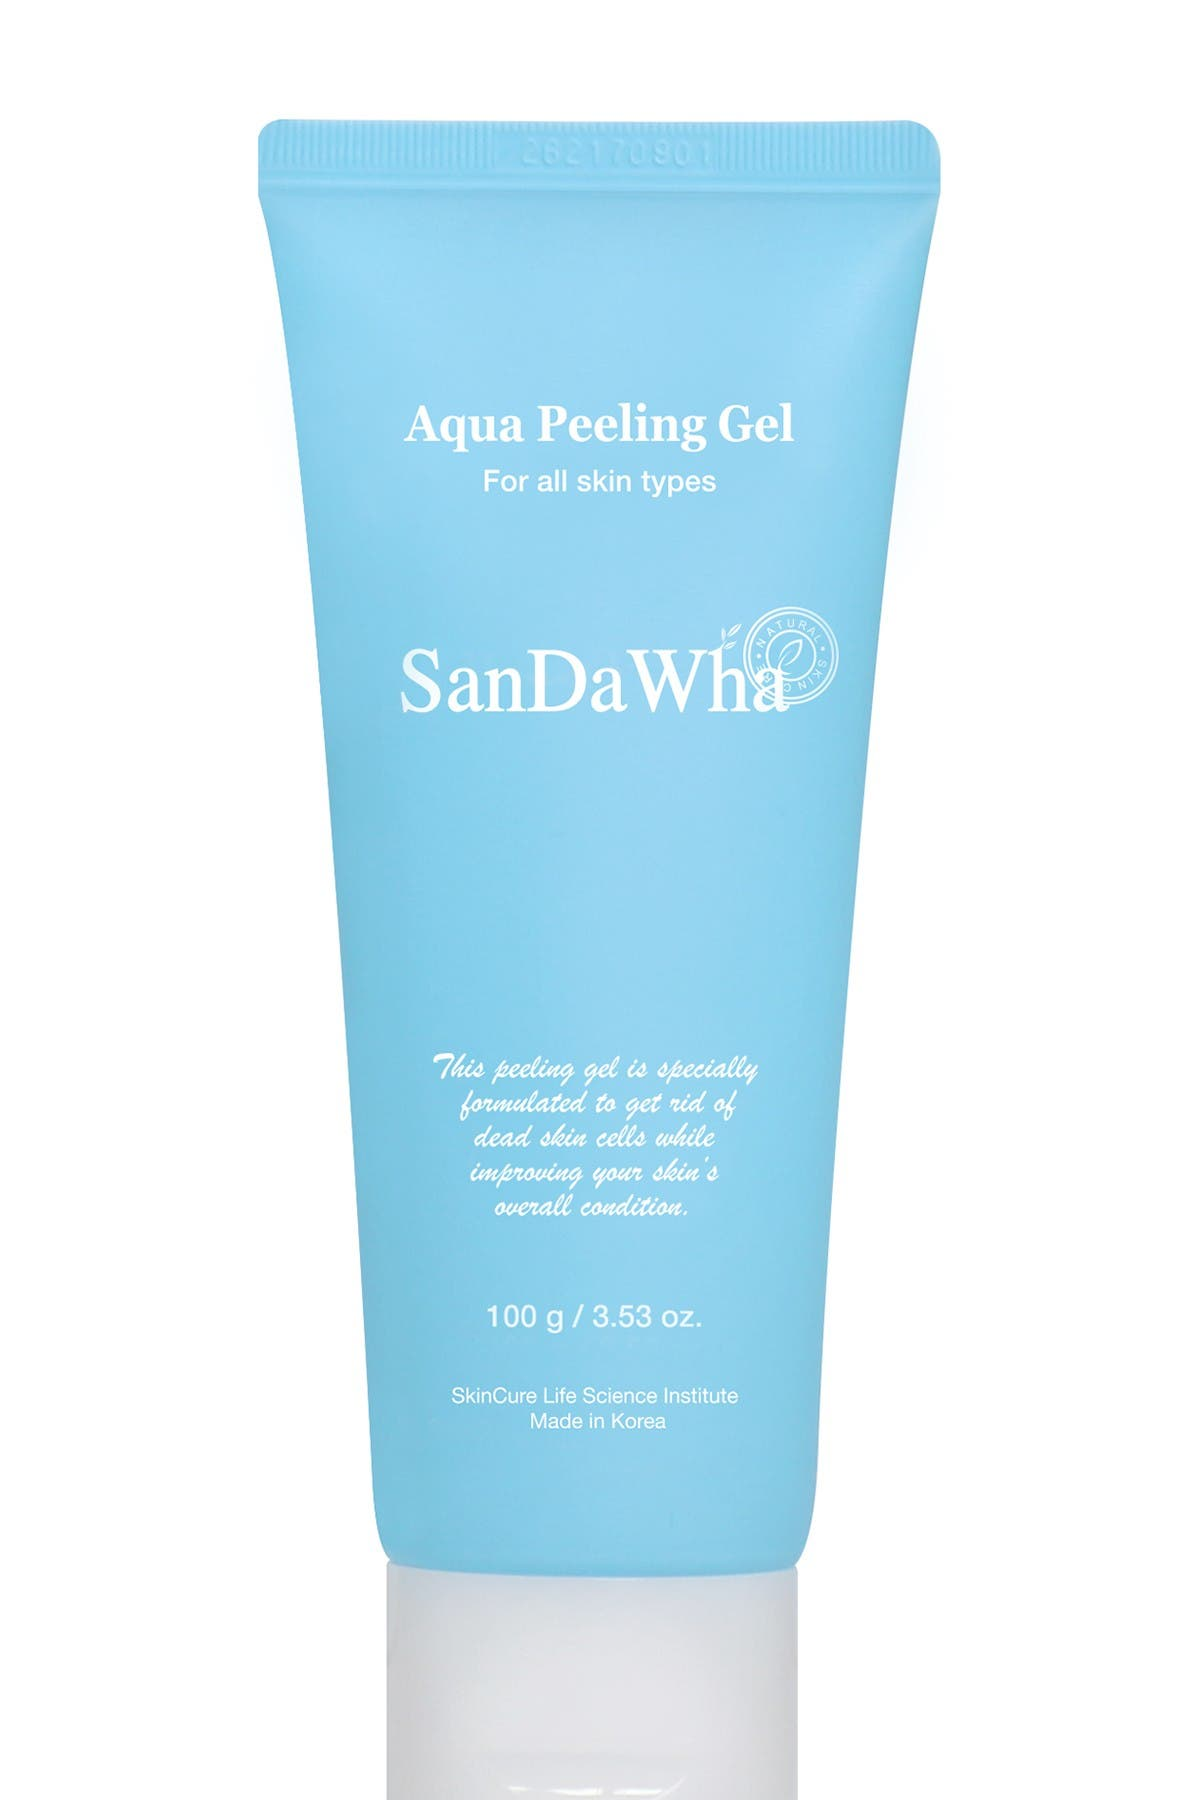 Image of SANDAWHA Aqua Peeling Gel